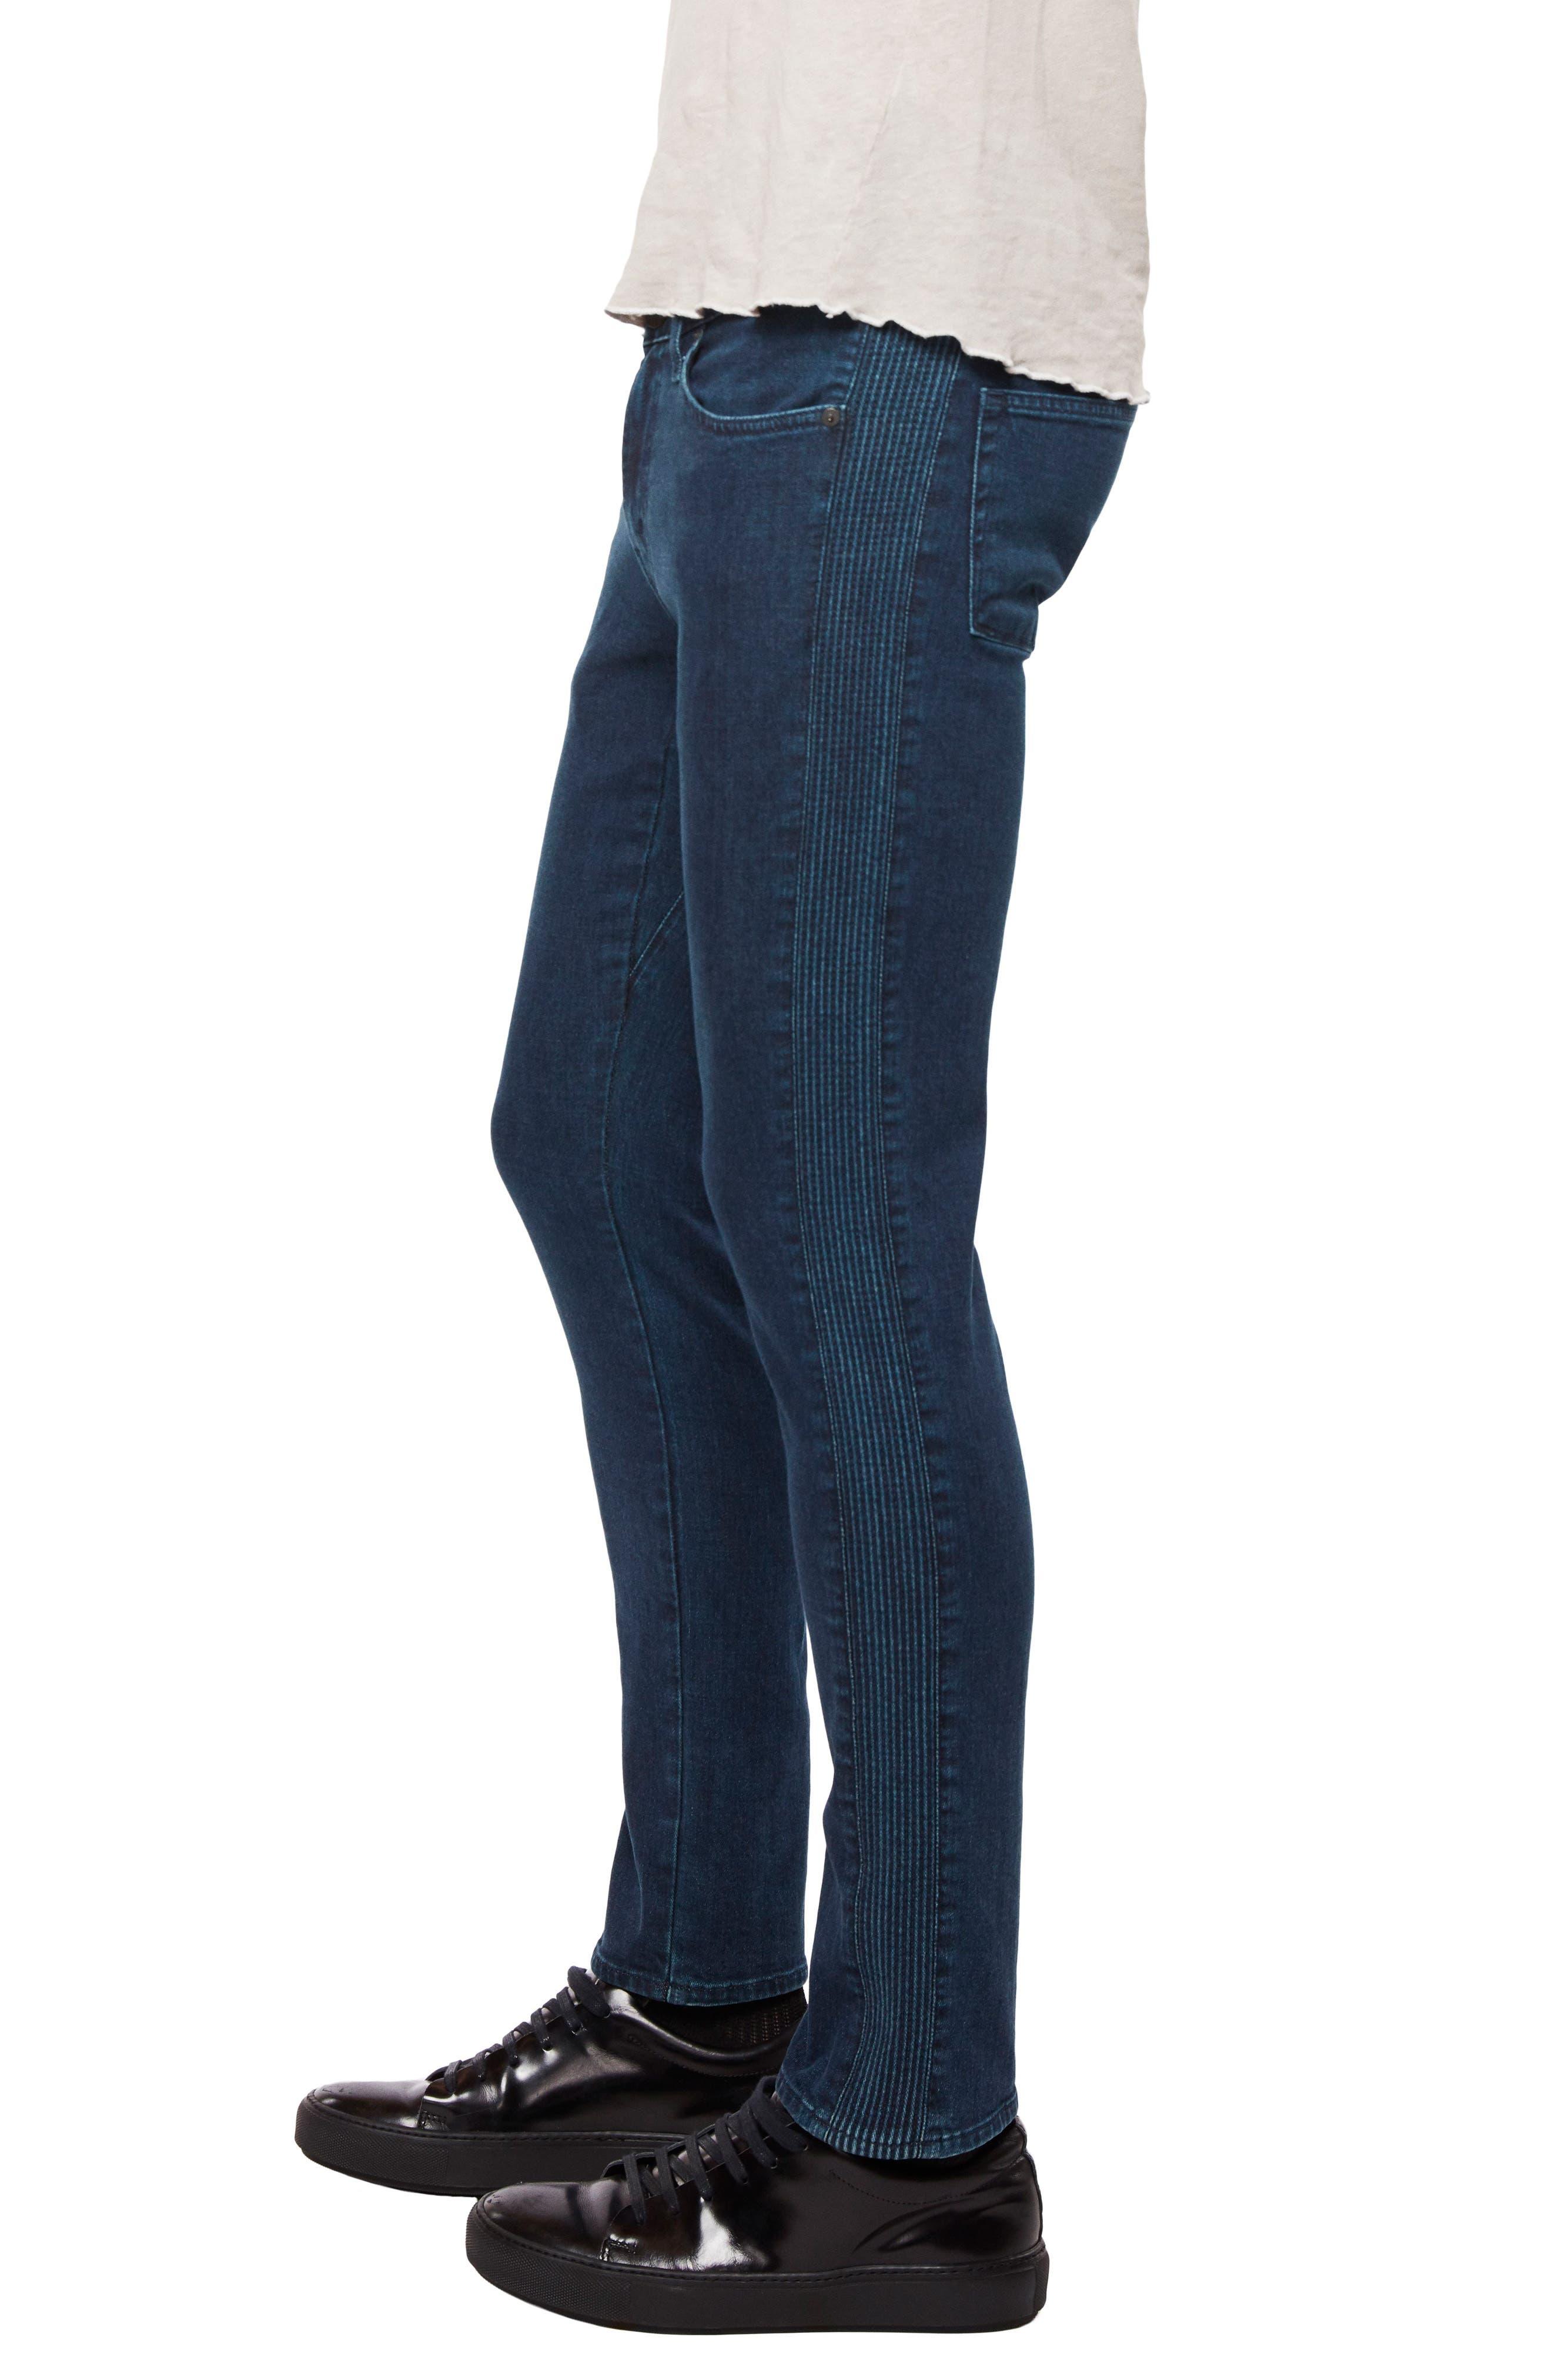 Moto Skinny Fit Jeans,                             Alternate thumbnail 3, color,                             403